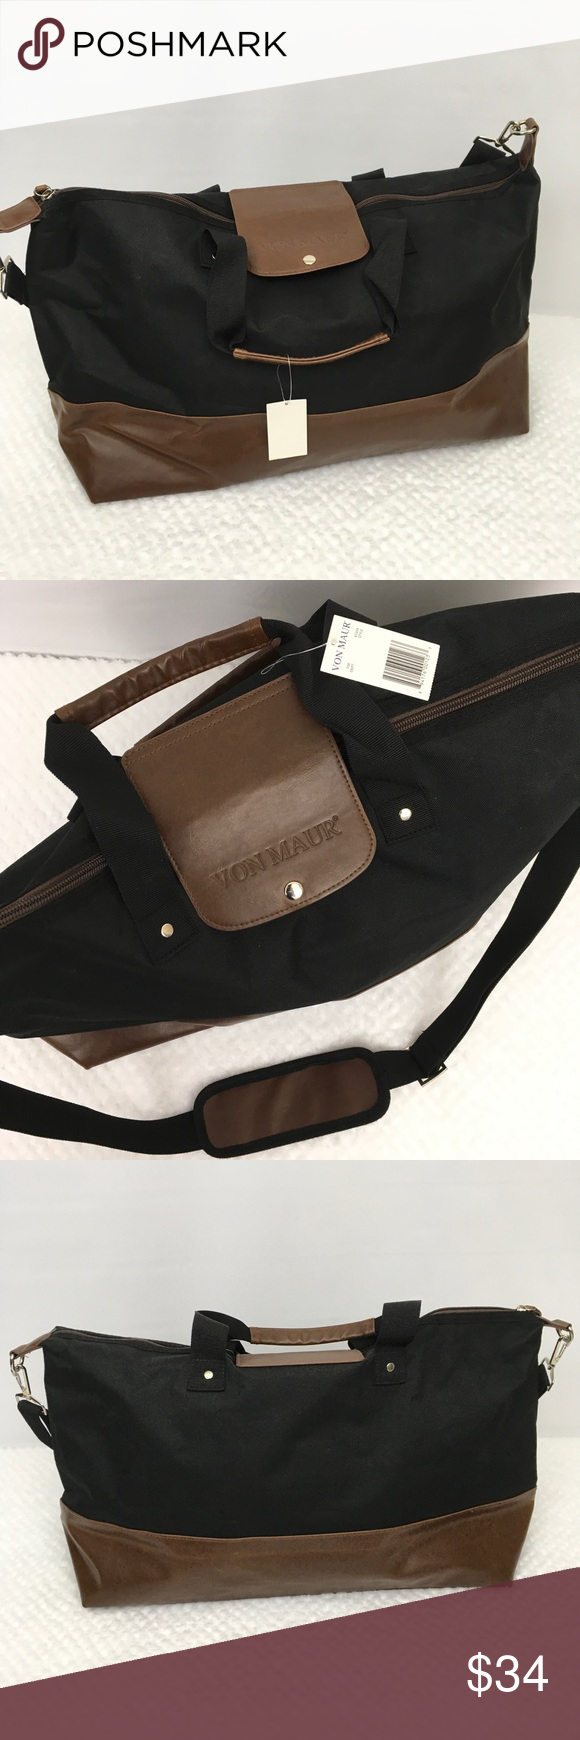 75e81598 Von Maur travel weekender bag black brown carry on A large weekender ...